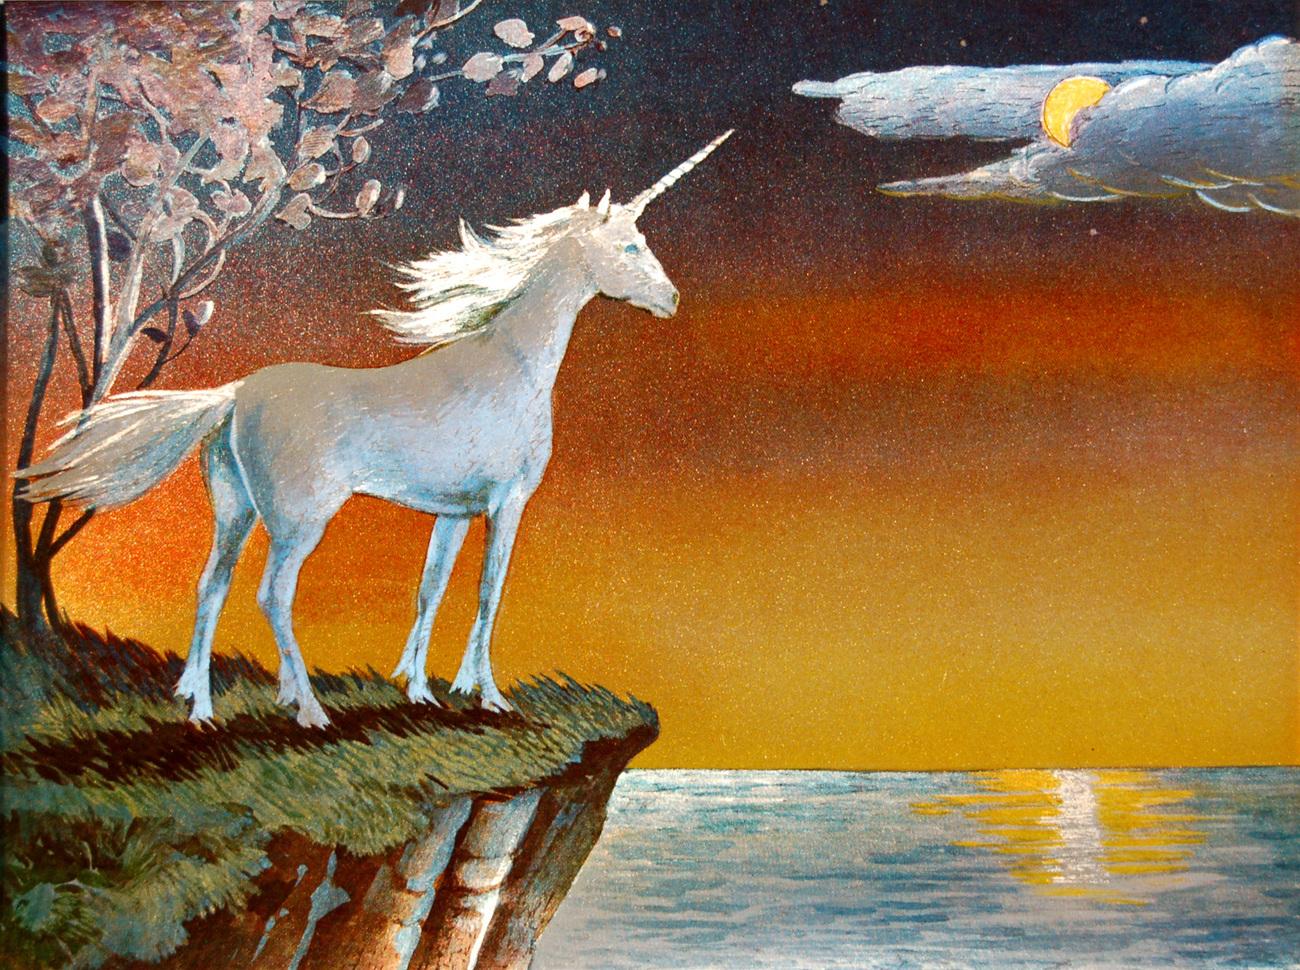 000000 unicorn